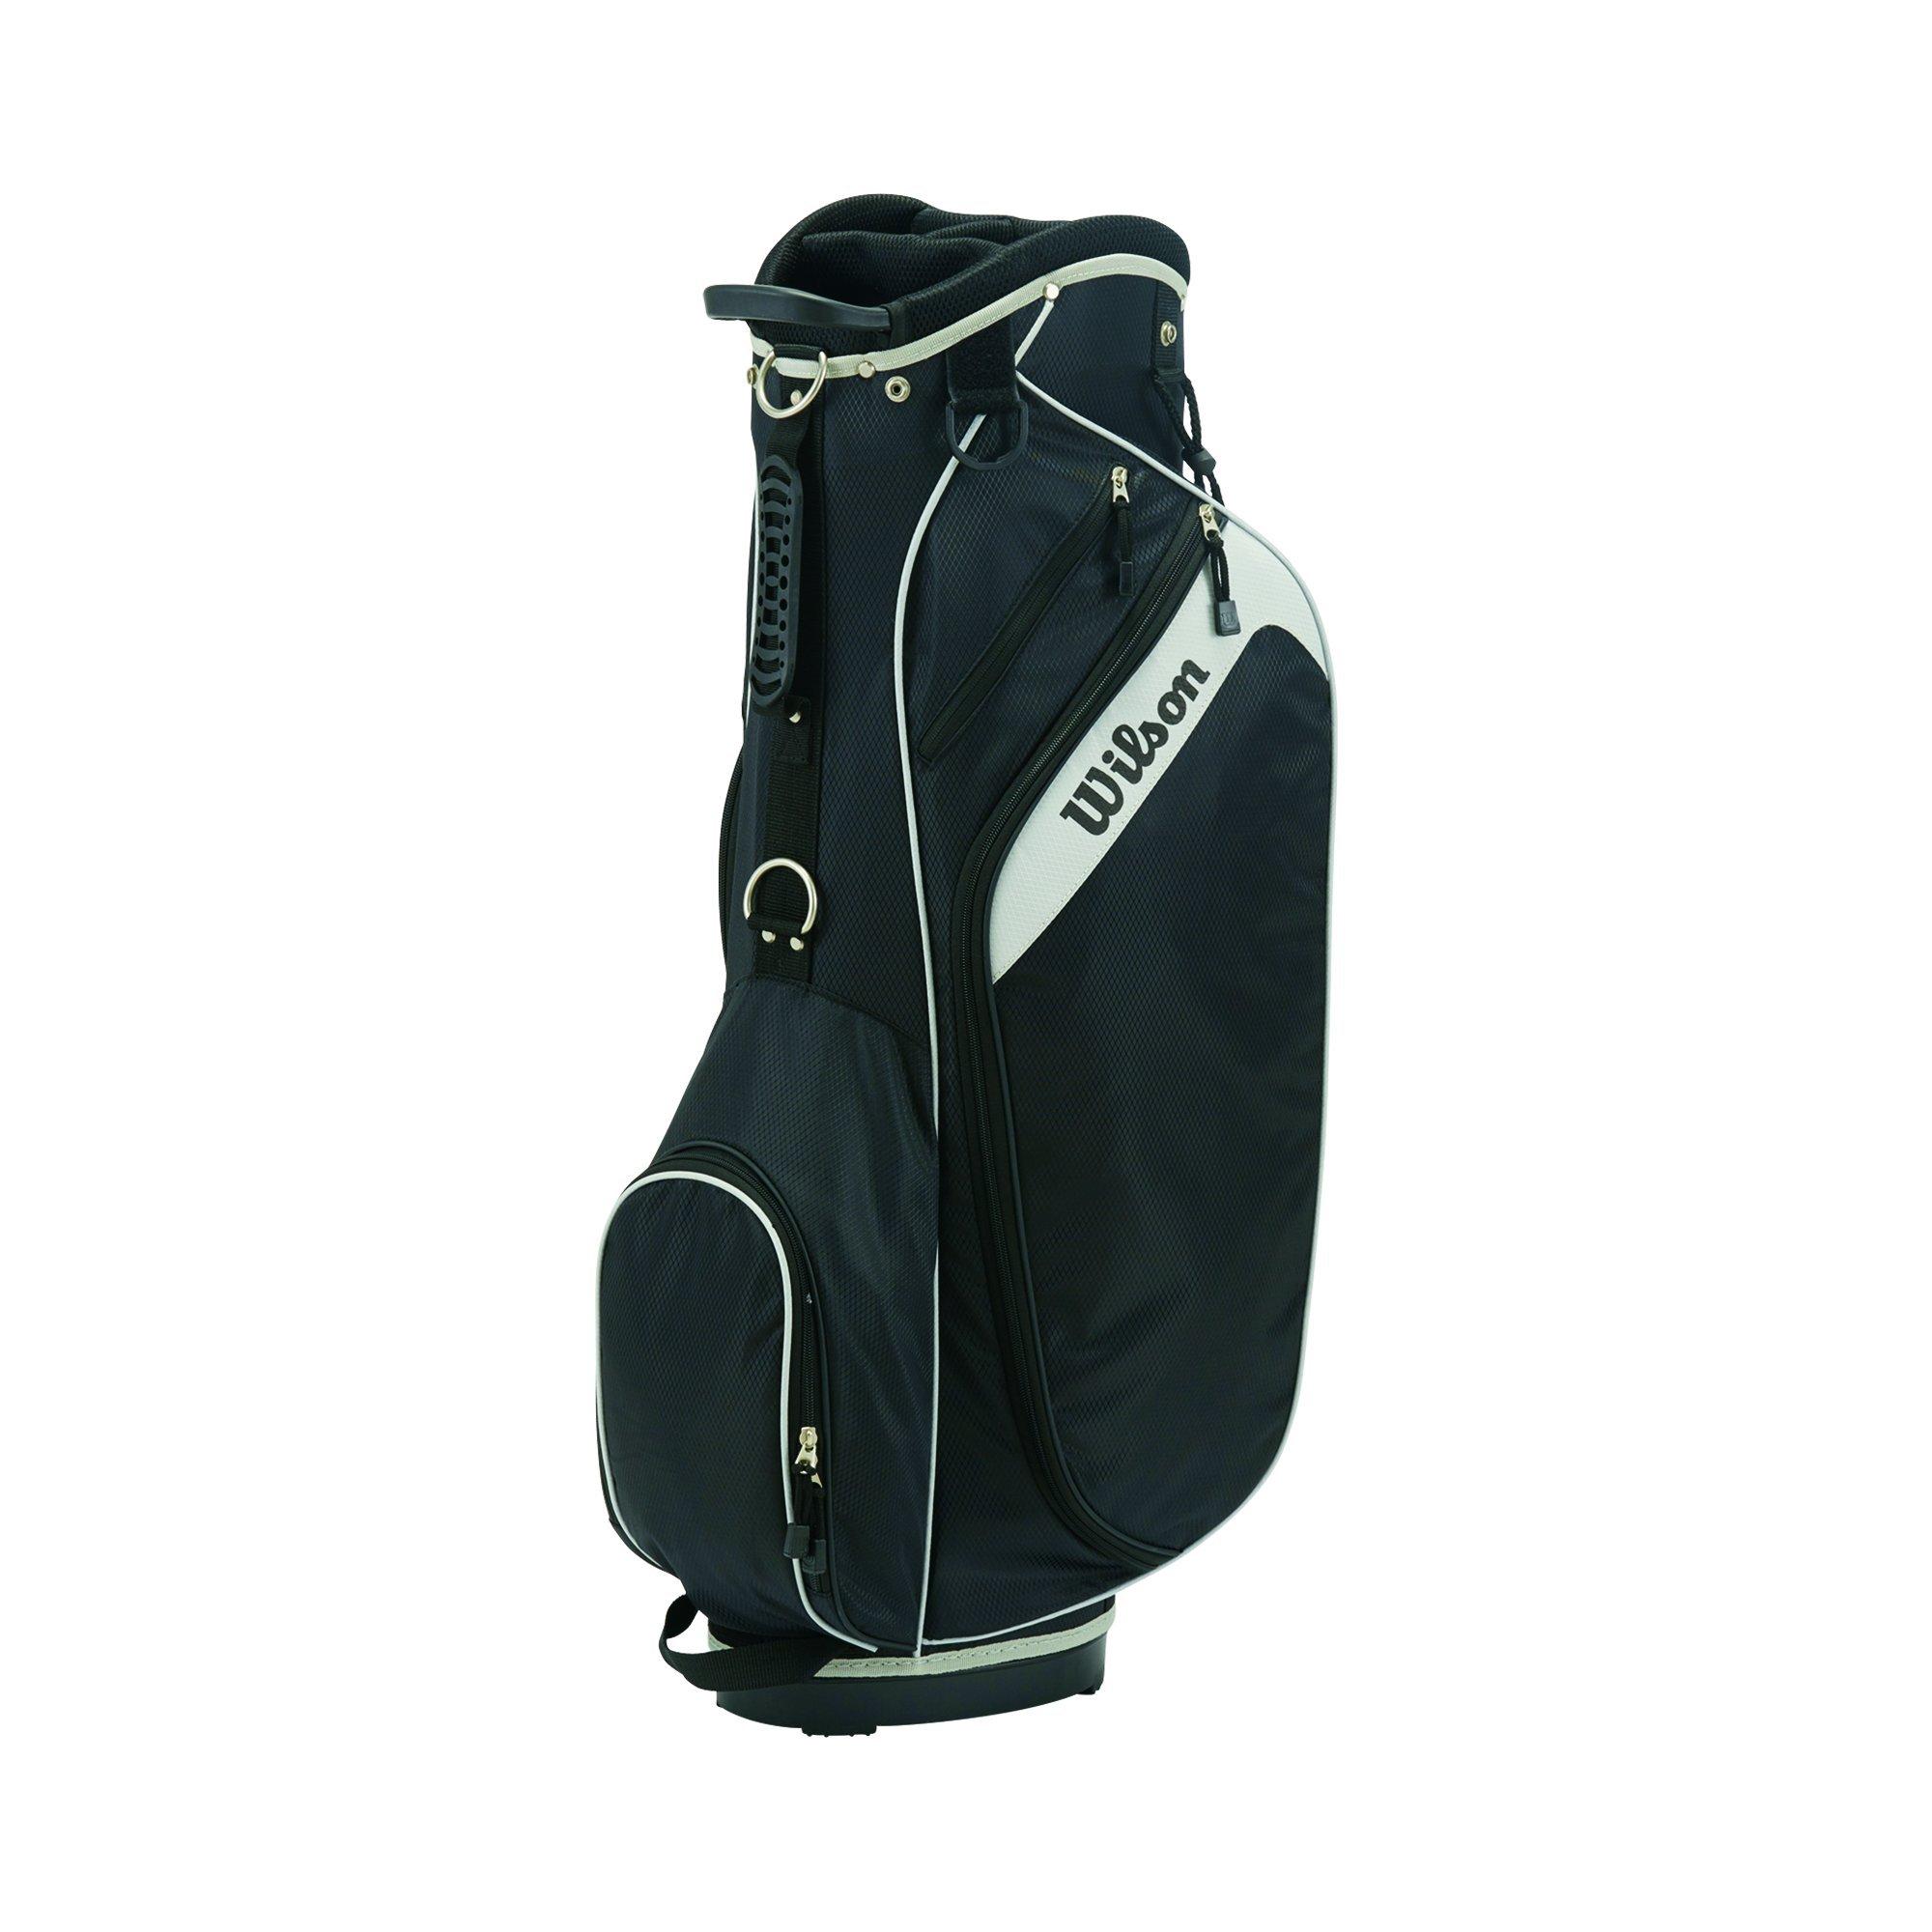 Wilson Golf Unisex Wilson Profile Bag Wilson Profile Golf Cart Bag, Black by Wilson Golf (Image #1)